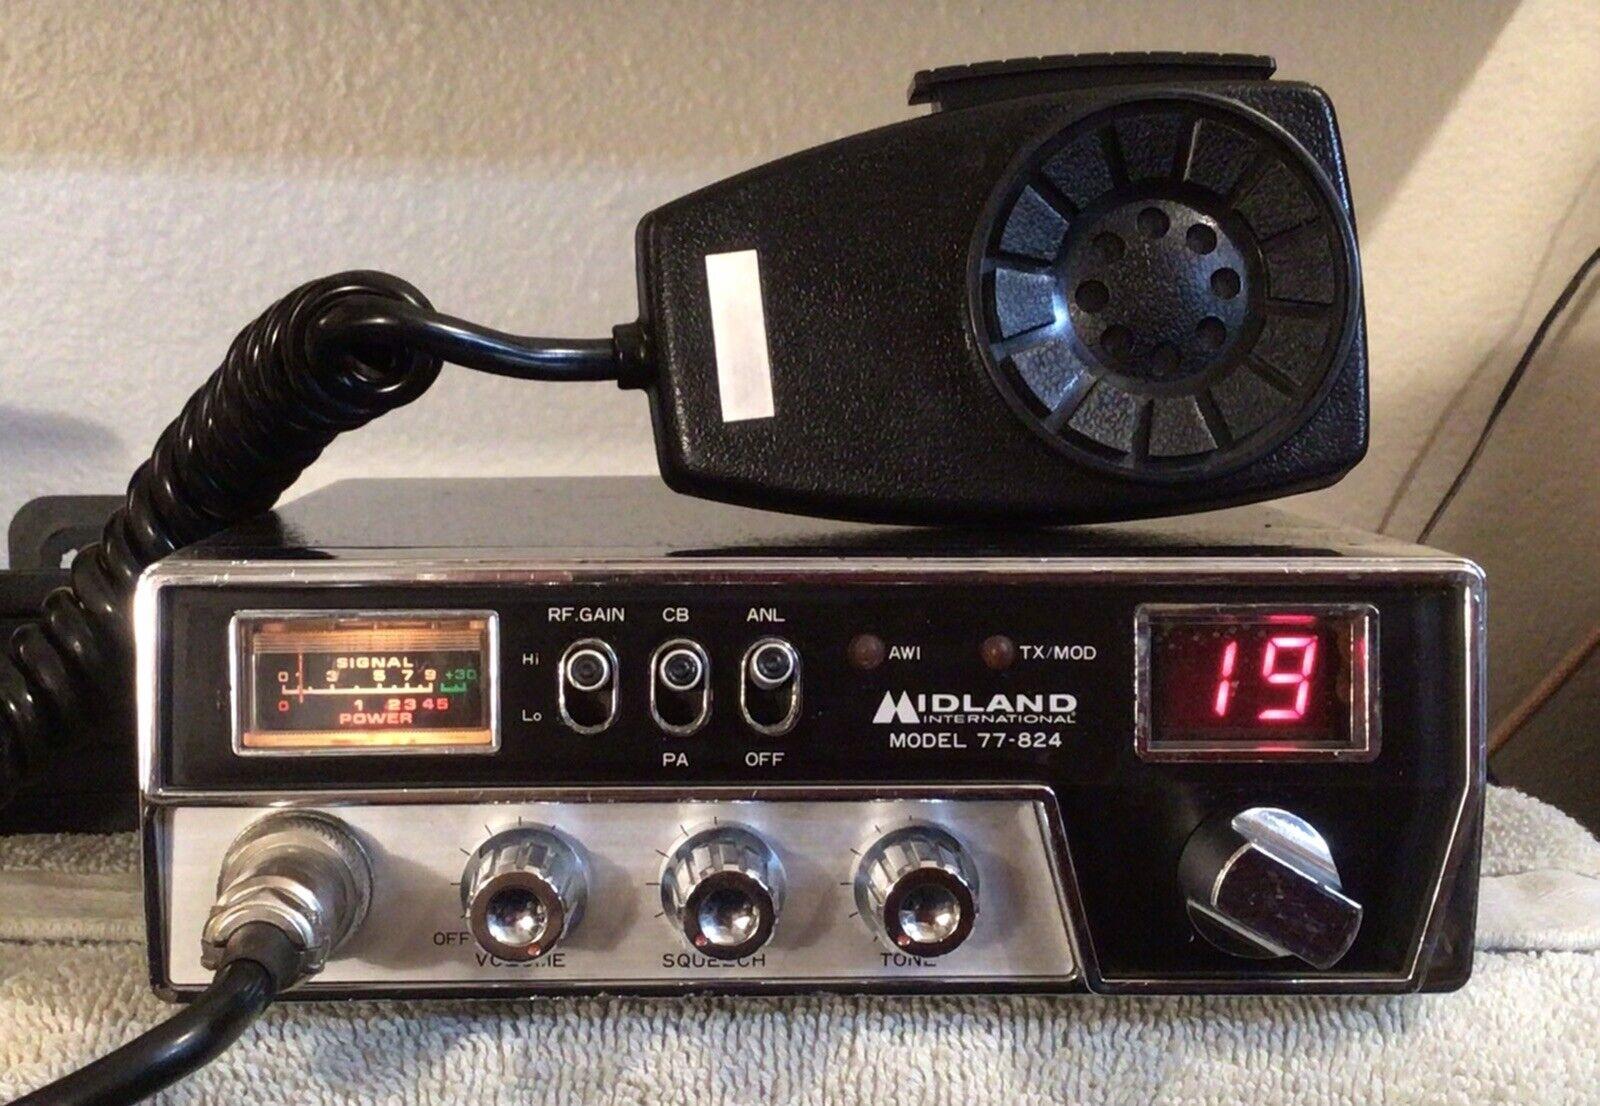 marprye_0 MIDLAND 77-824 40CH CB RADIO.   ***FREE SHIPPING!***